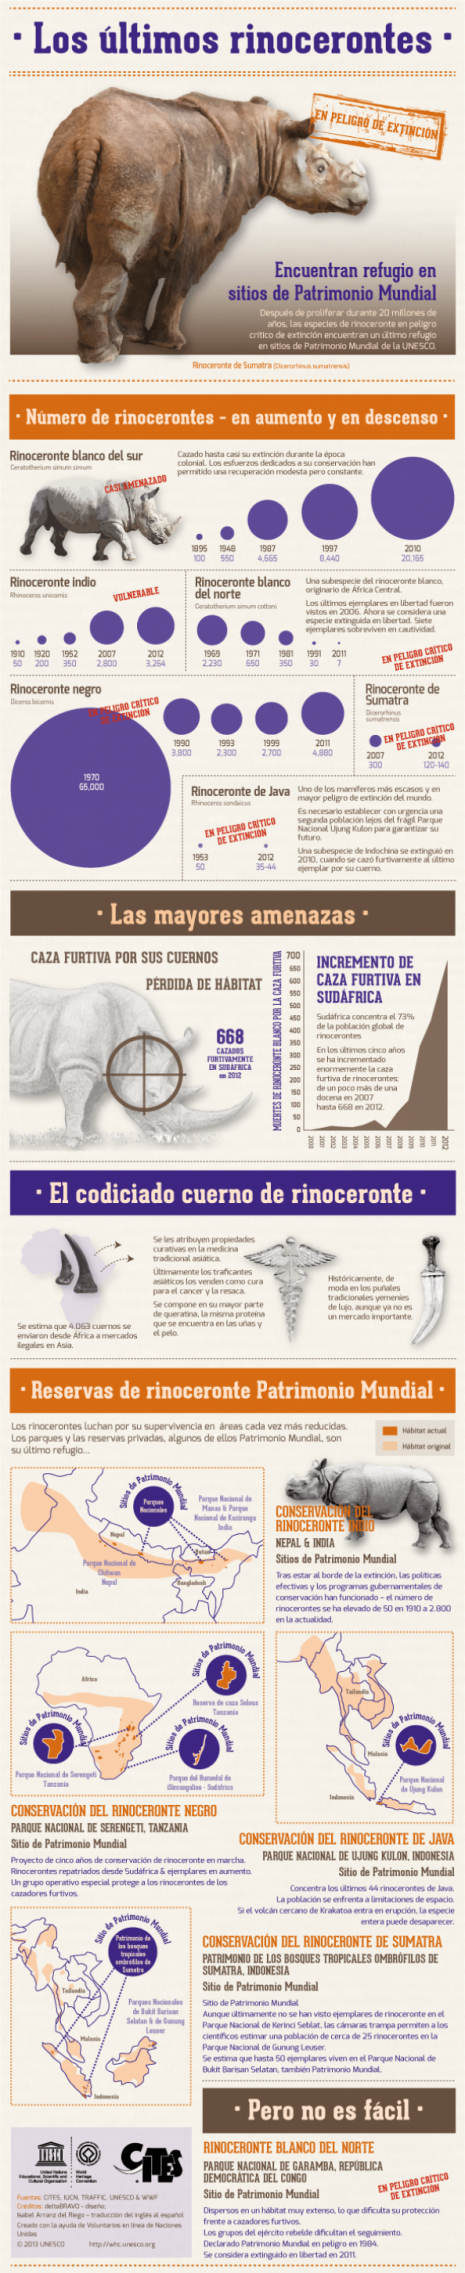 infografia_los_ultimos_rinocerontes